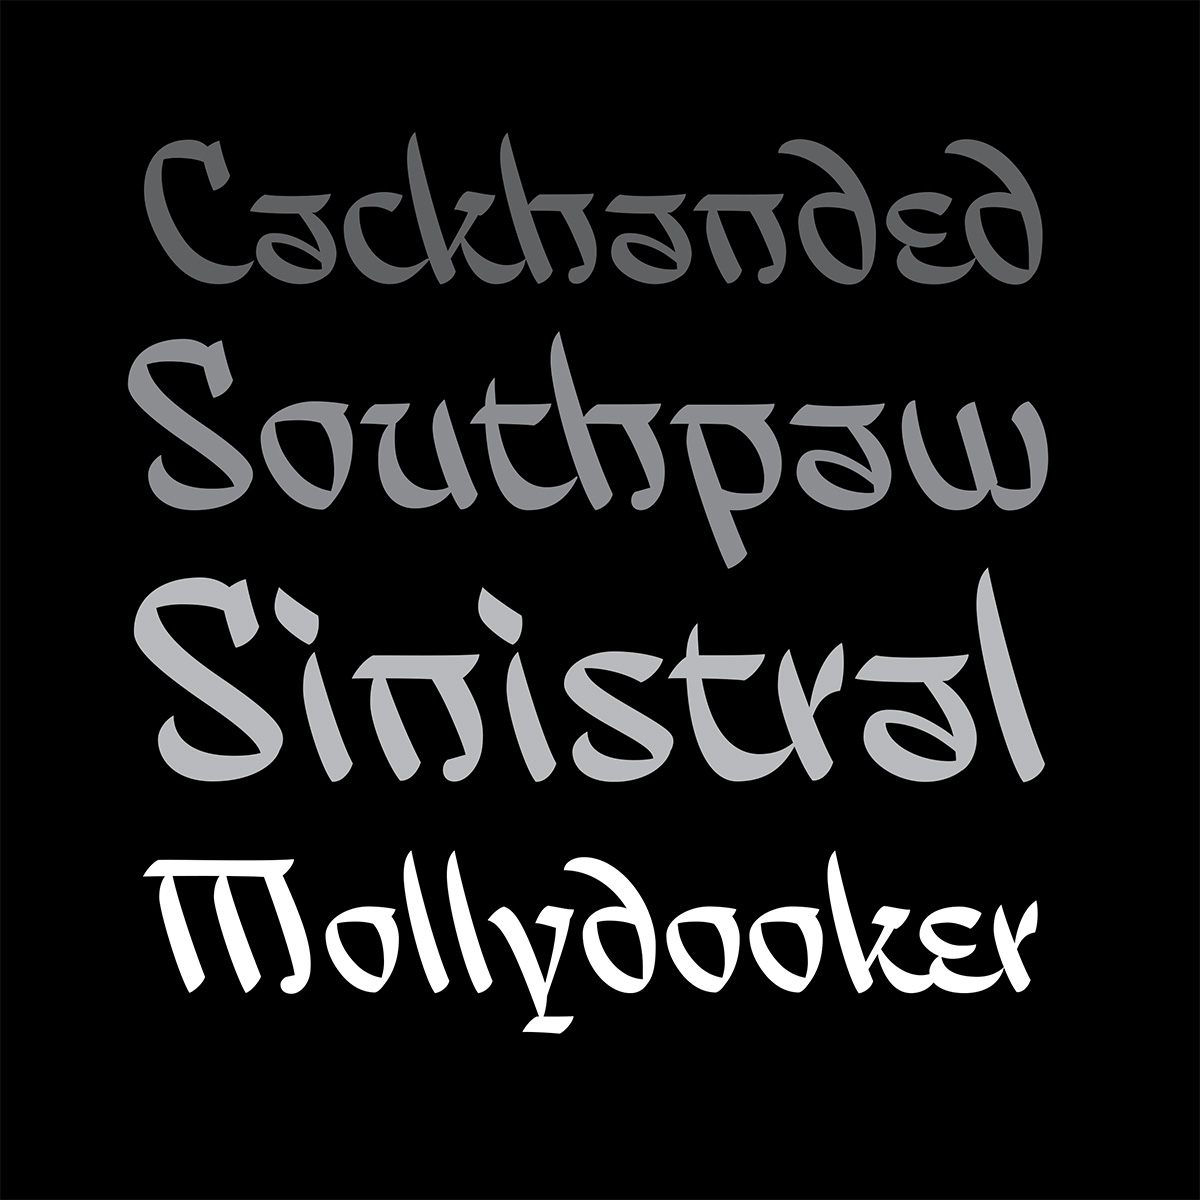 Mollydooker_FutureFonts-1.jpg